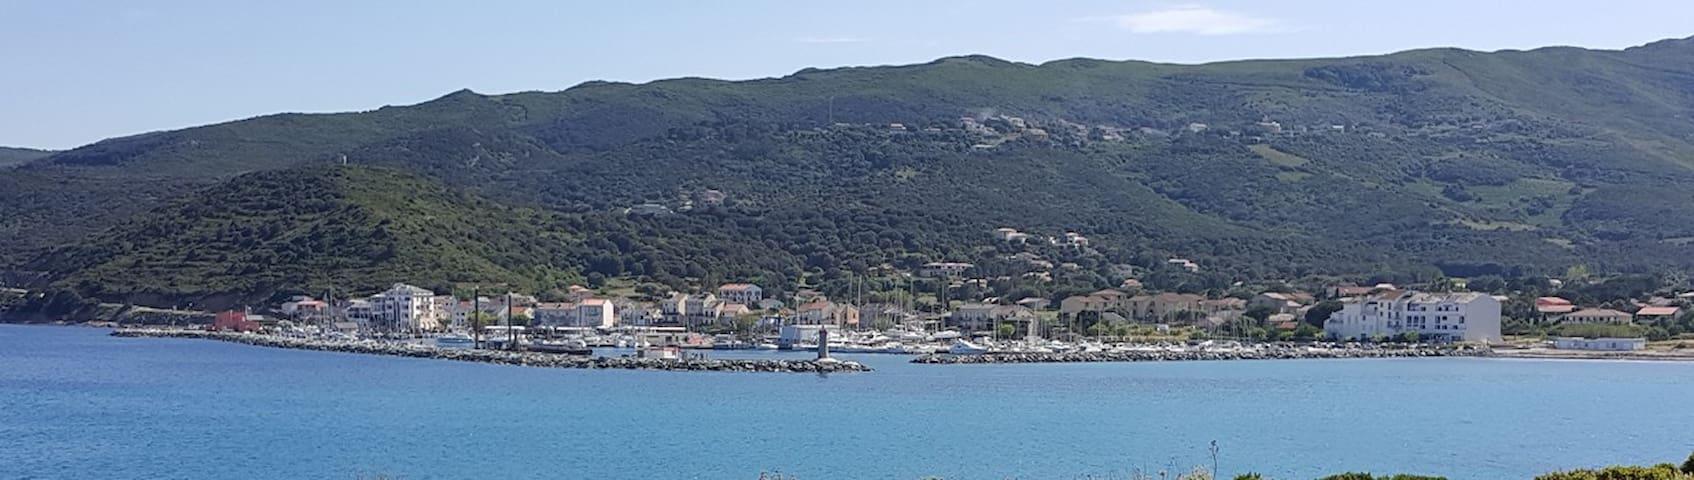 Petit Studio sympa à 200m du port de Macinaggio D - Haute-Corse - Apartamento